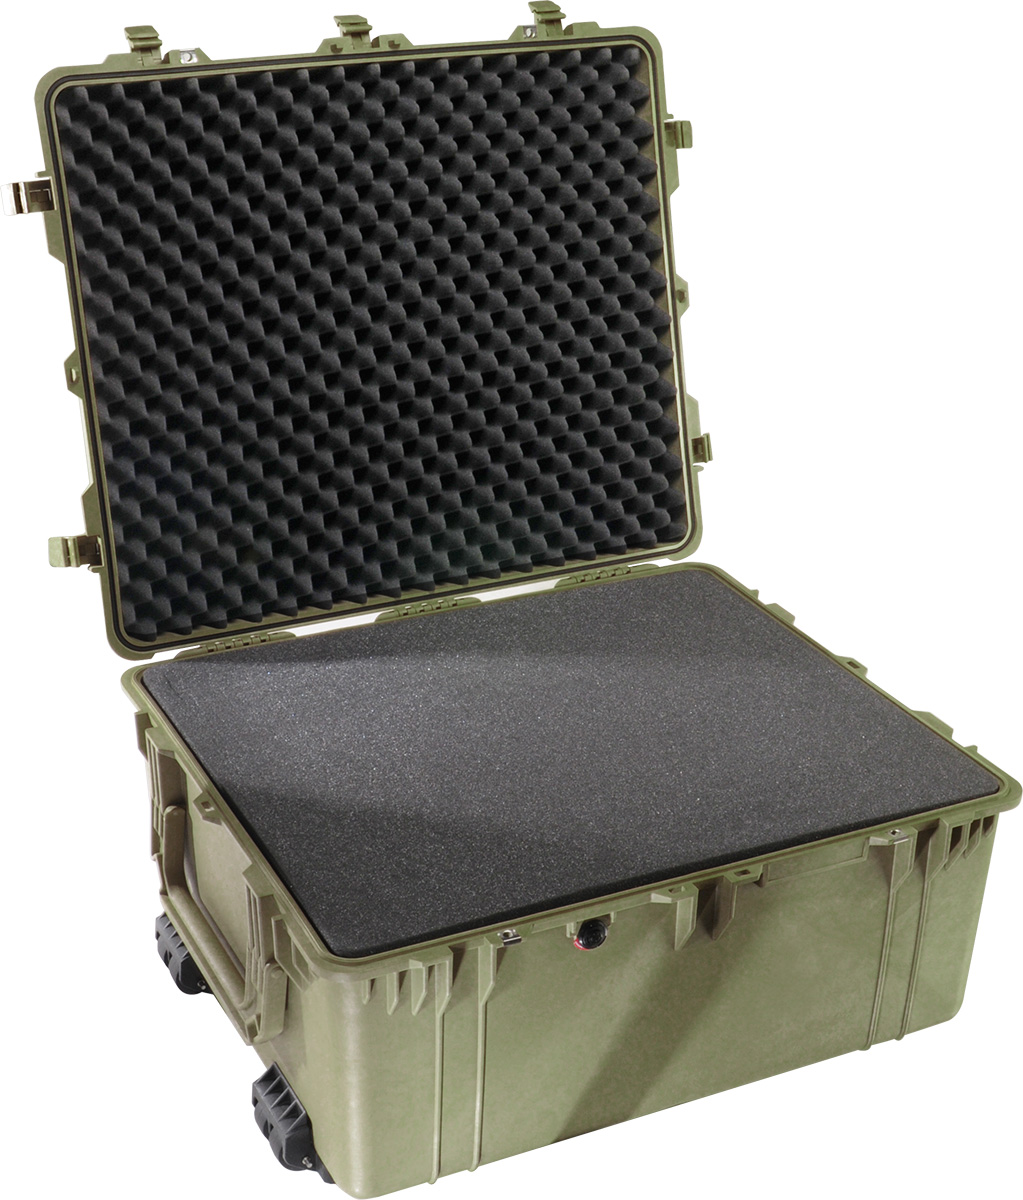 pelican 1690 green foam protector case